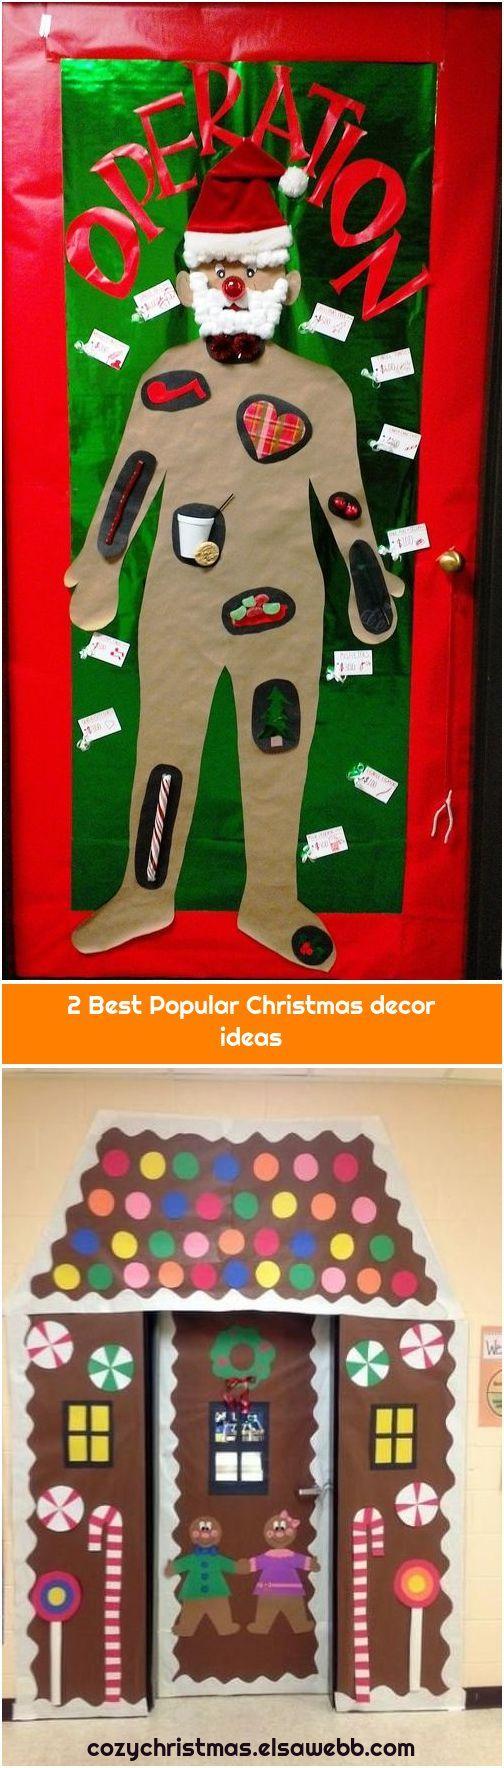 2 Best Popular Christmas decor ideas 1. Operation Christmas Door Operation Christmas Door We are wa